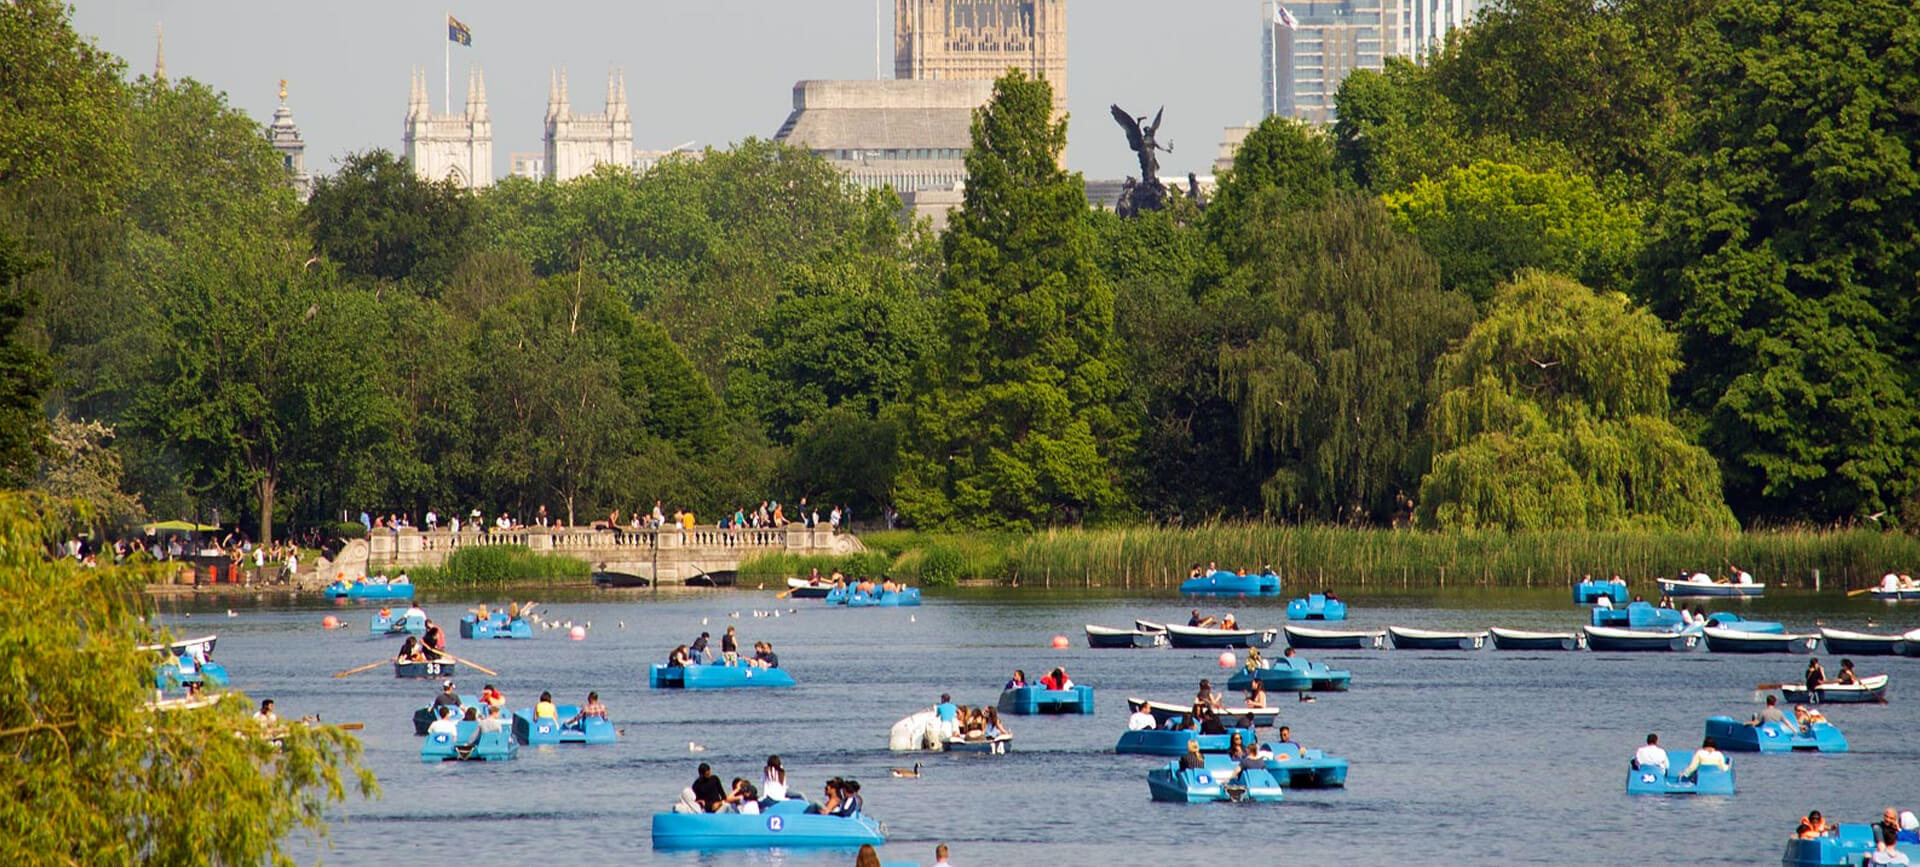 The Serpentine Boating Lake – Mayfair London